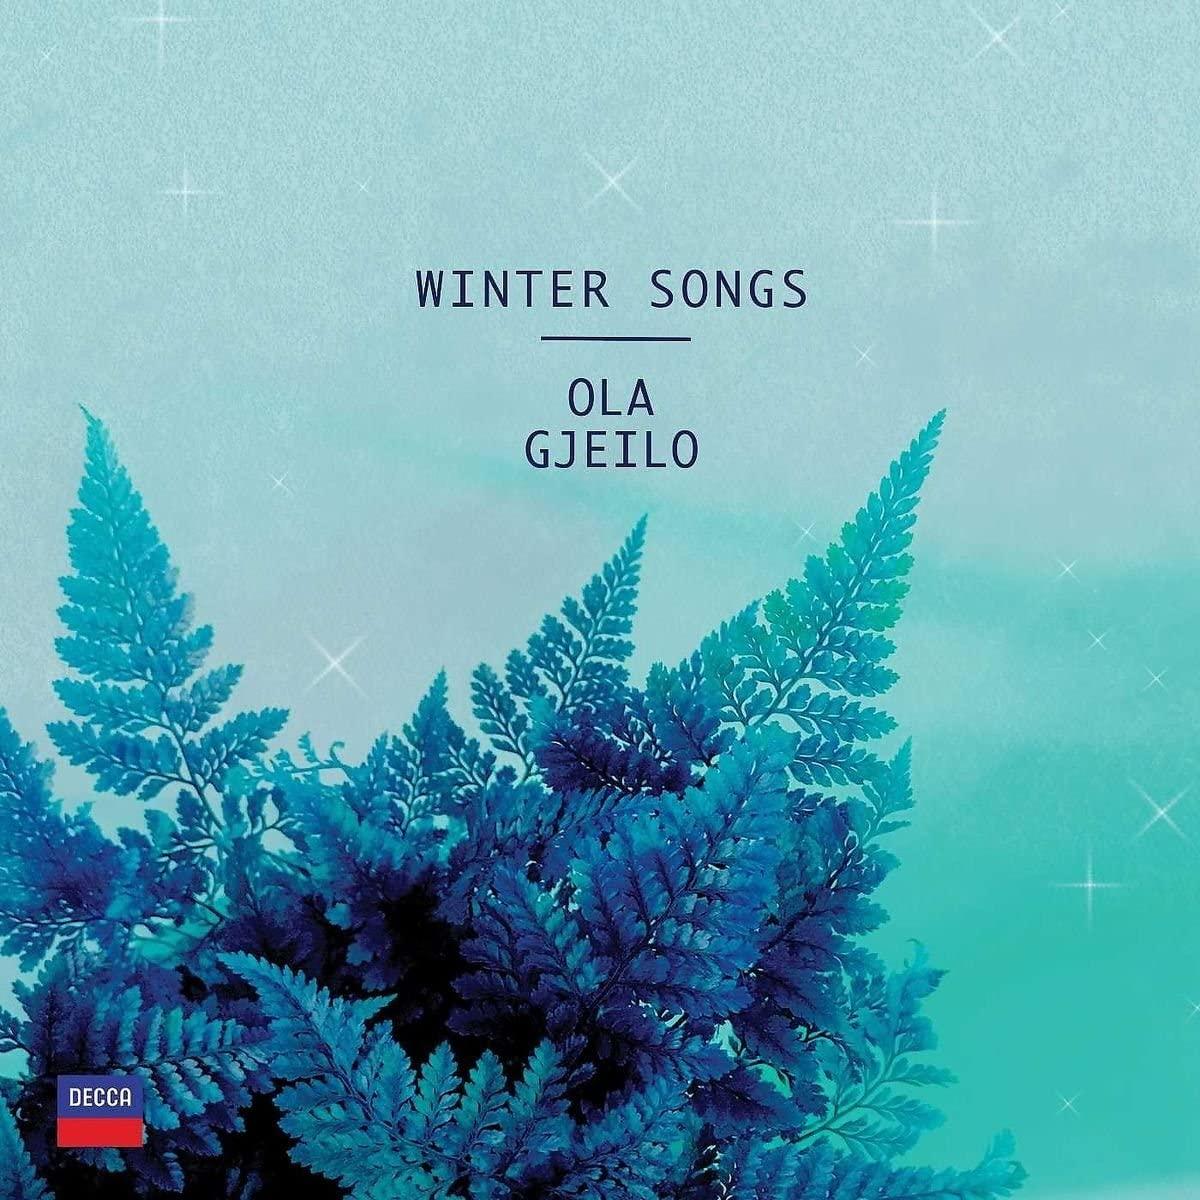 Winter Songs  - Ola Gjeilo